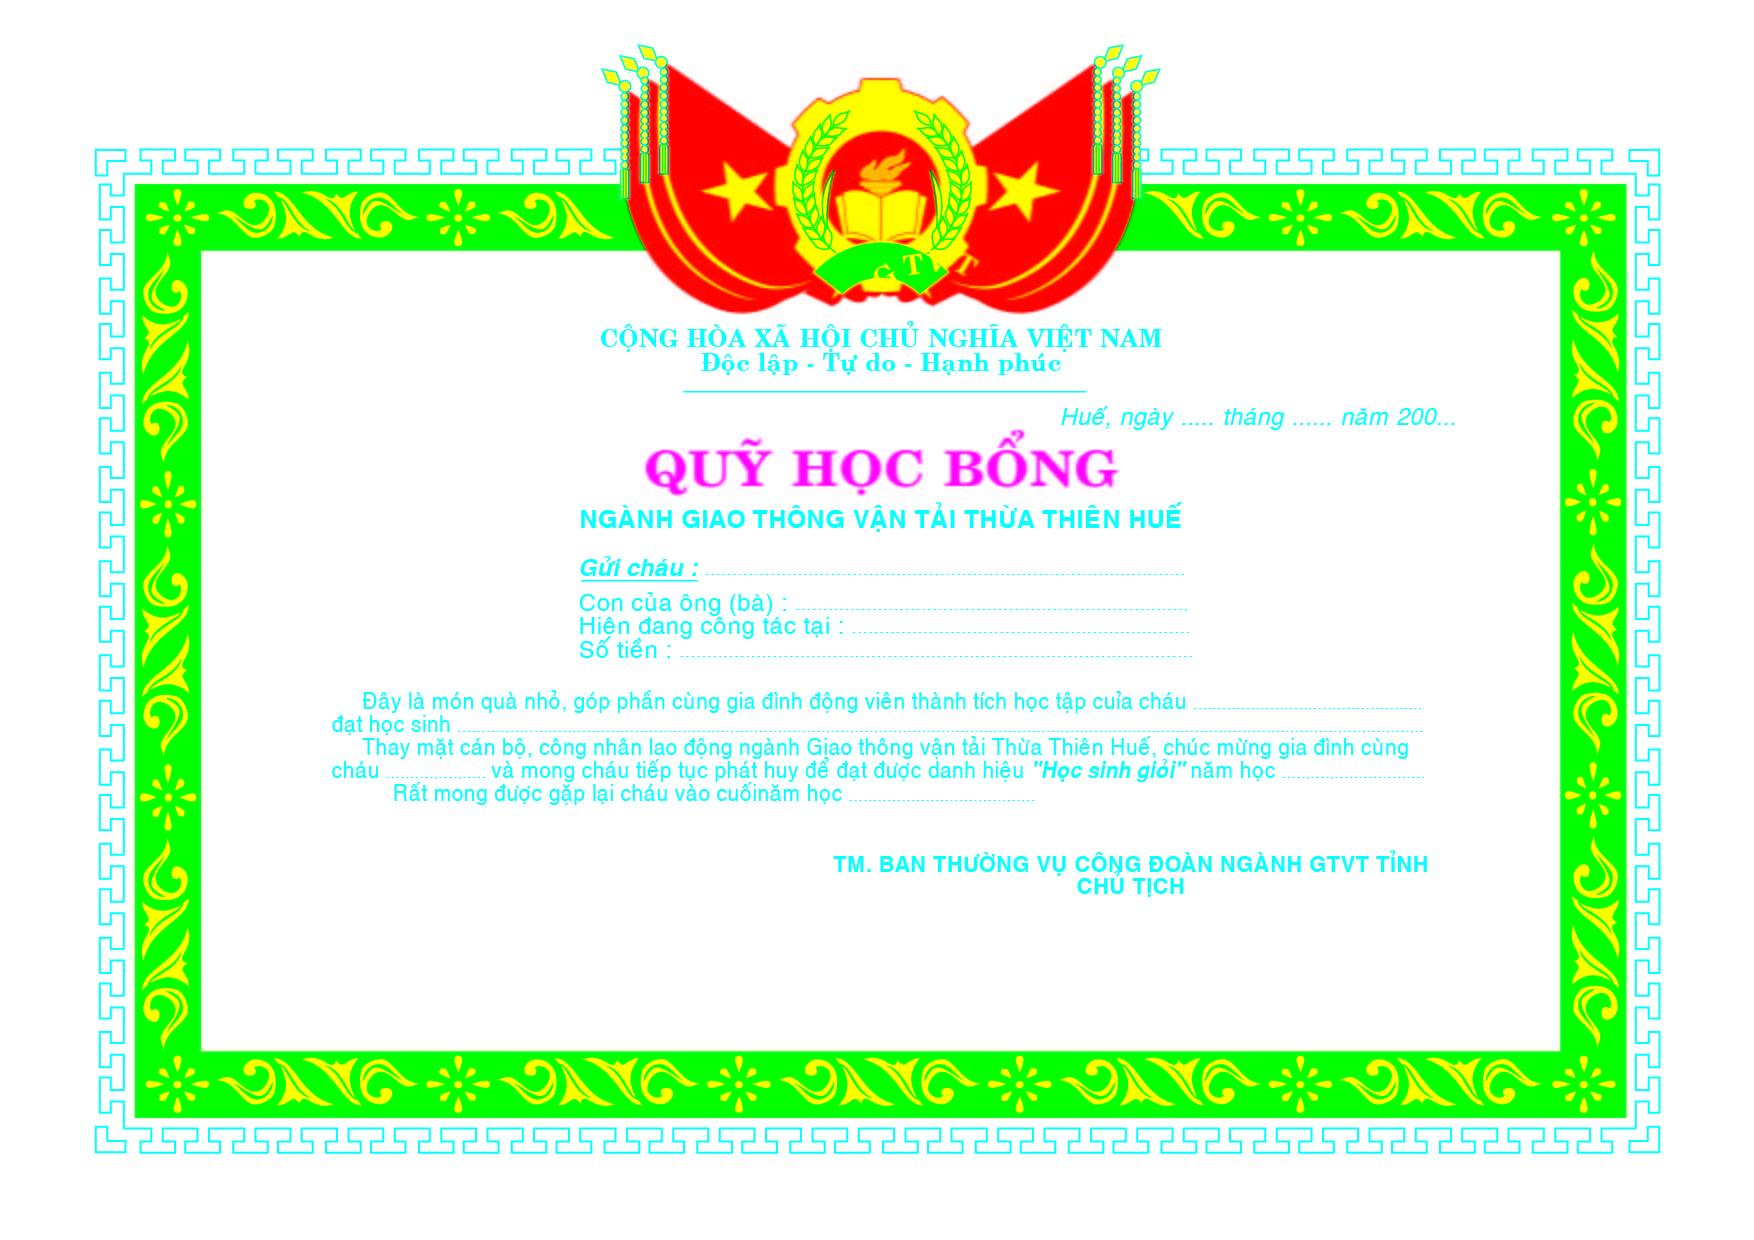 Mẫu giấy khen 031- Mẫu giấy khen quỹ học bổng - link download : https://adsnew.net/QDK6